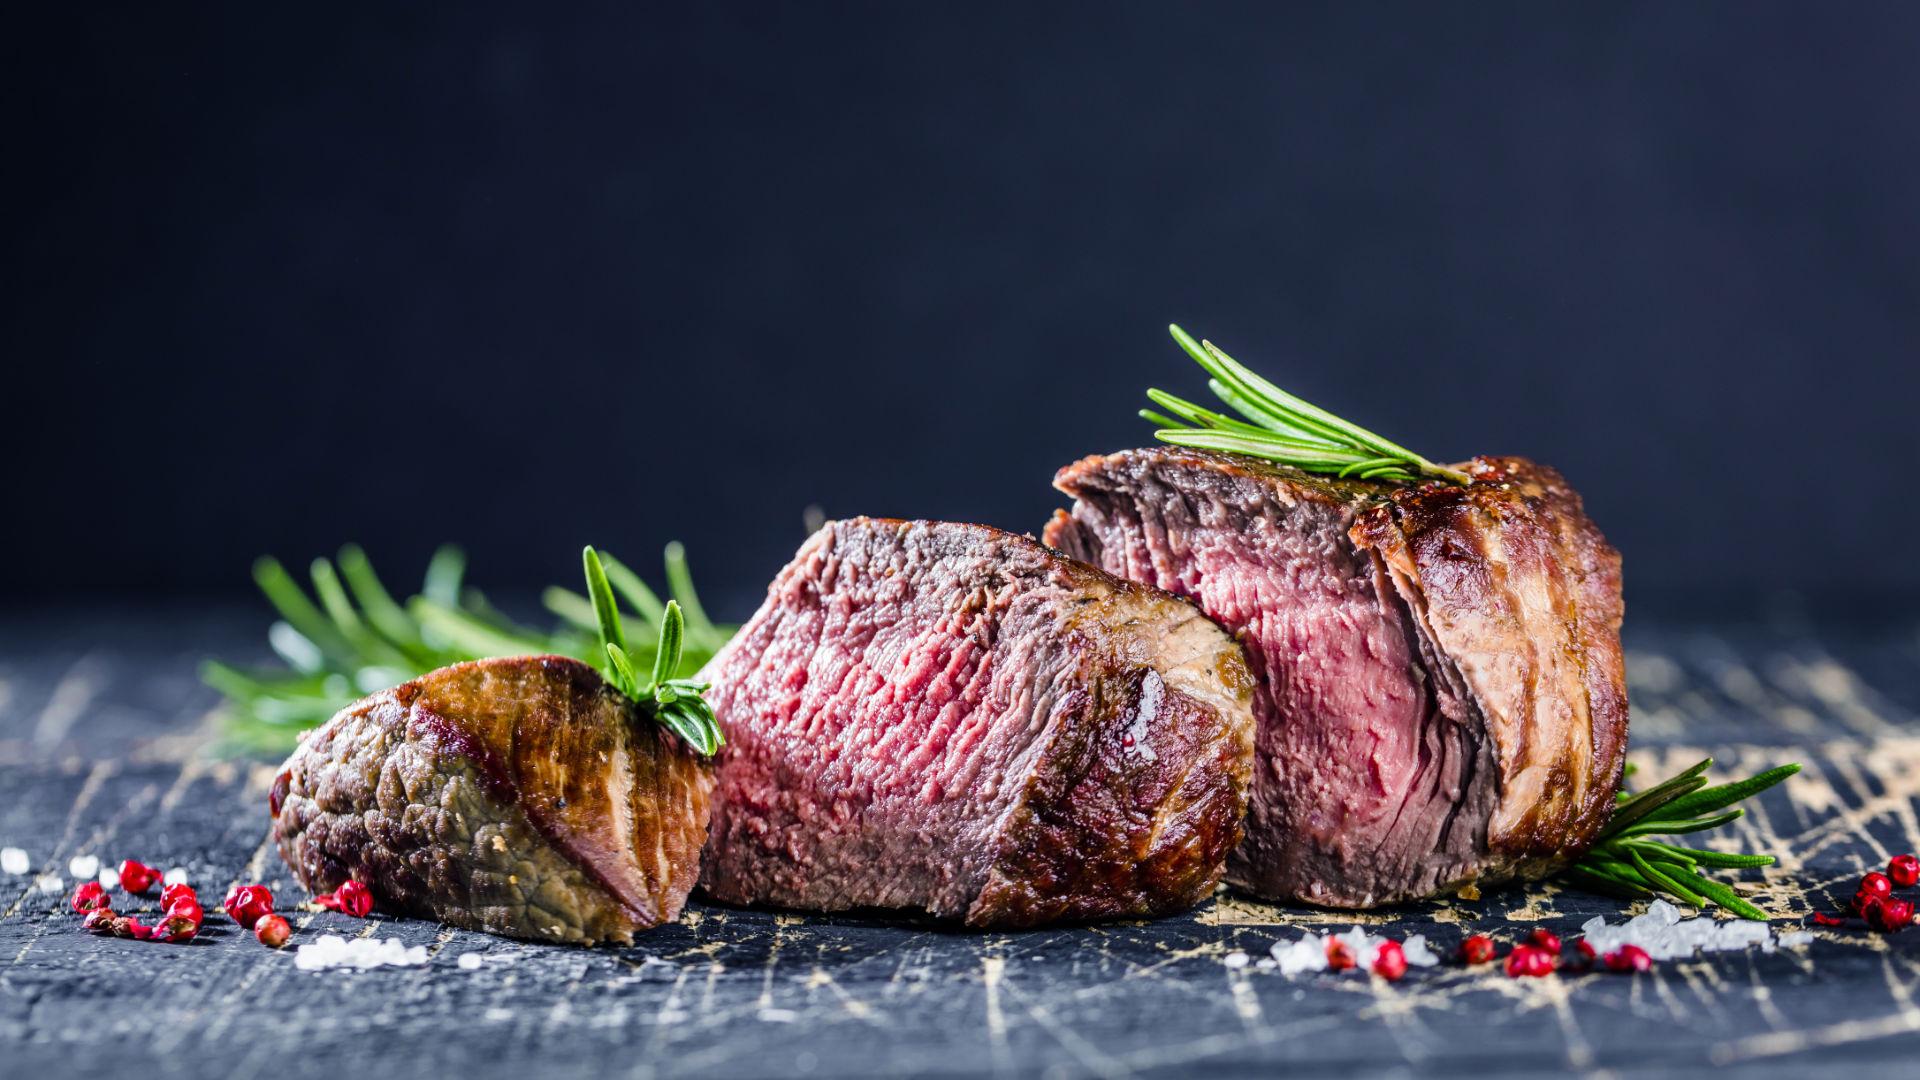 Rosa gebratenes Beef-Steak mit Kräutern